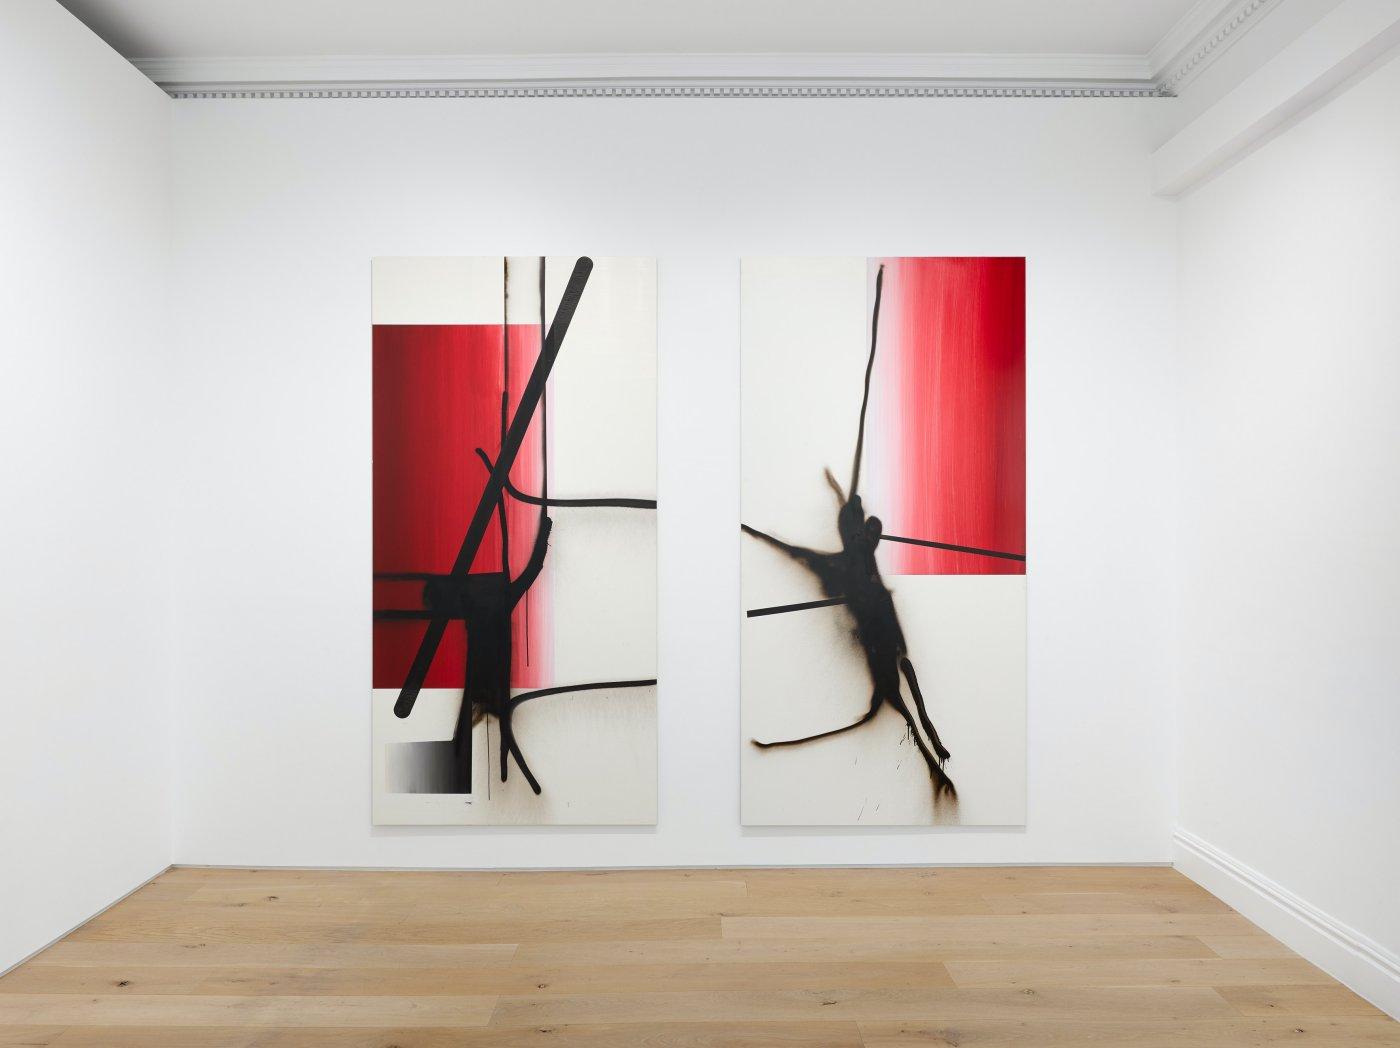 Galerie Max Hetzler London Carroll Dunham Albert Oehlen 6